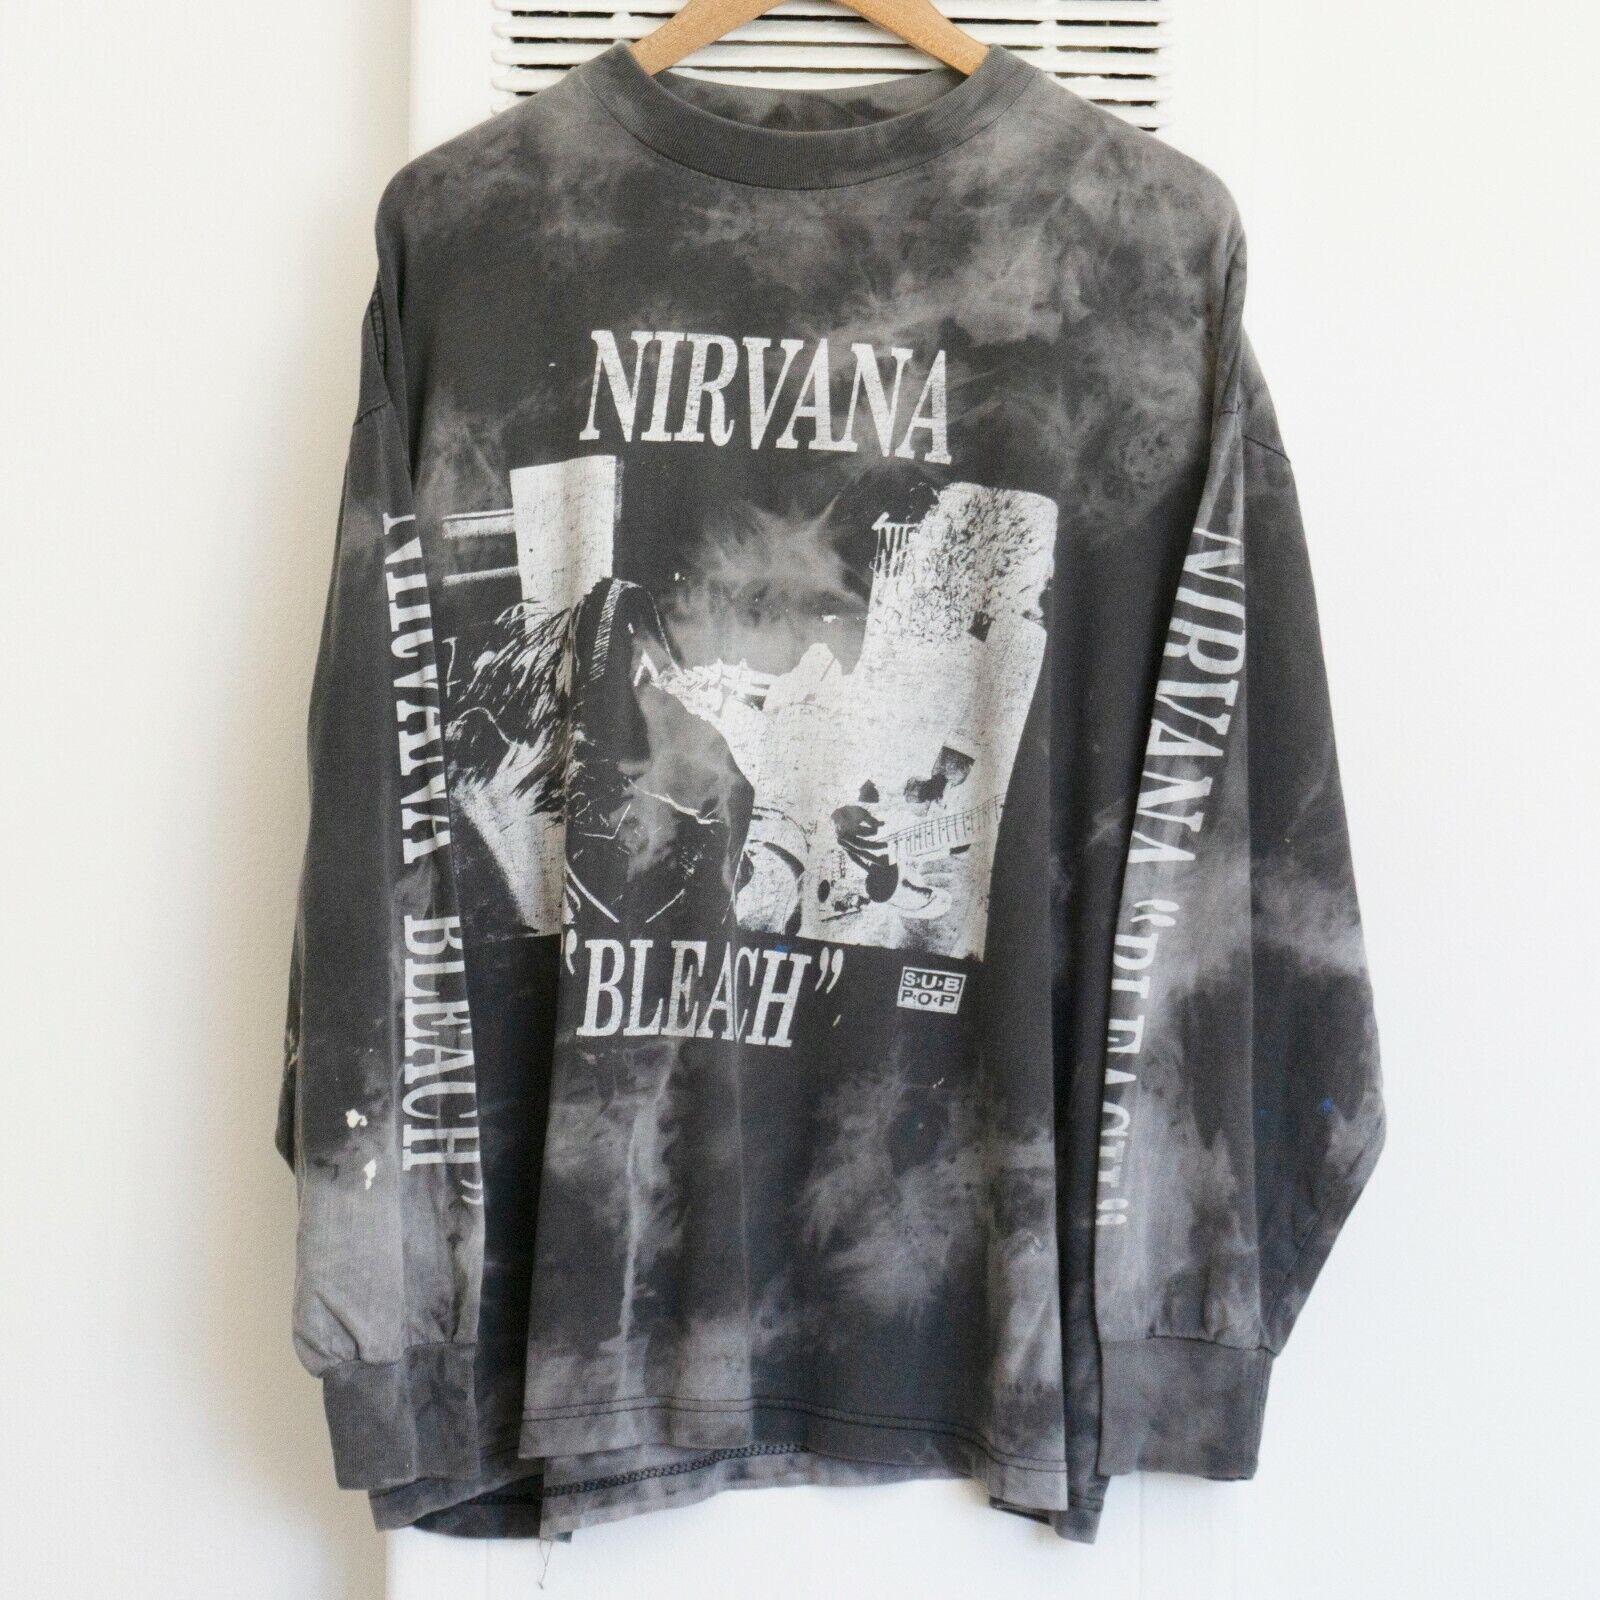 "Vintage 90s Nirvana ""Bleach"" Long Sleeve T-shirt Tie Dye Bjork Dinosaur Jr"